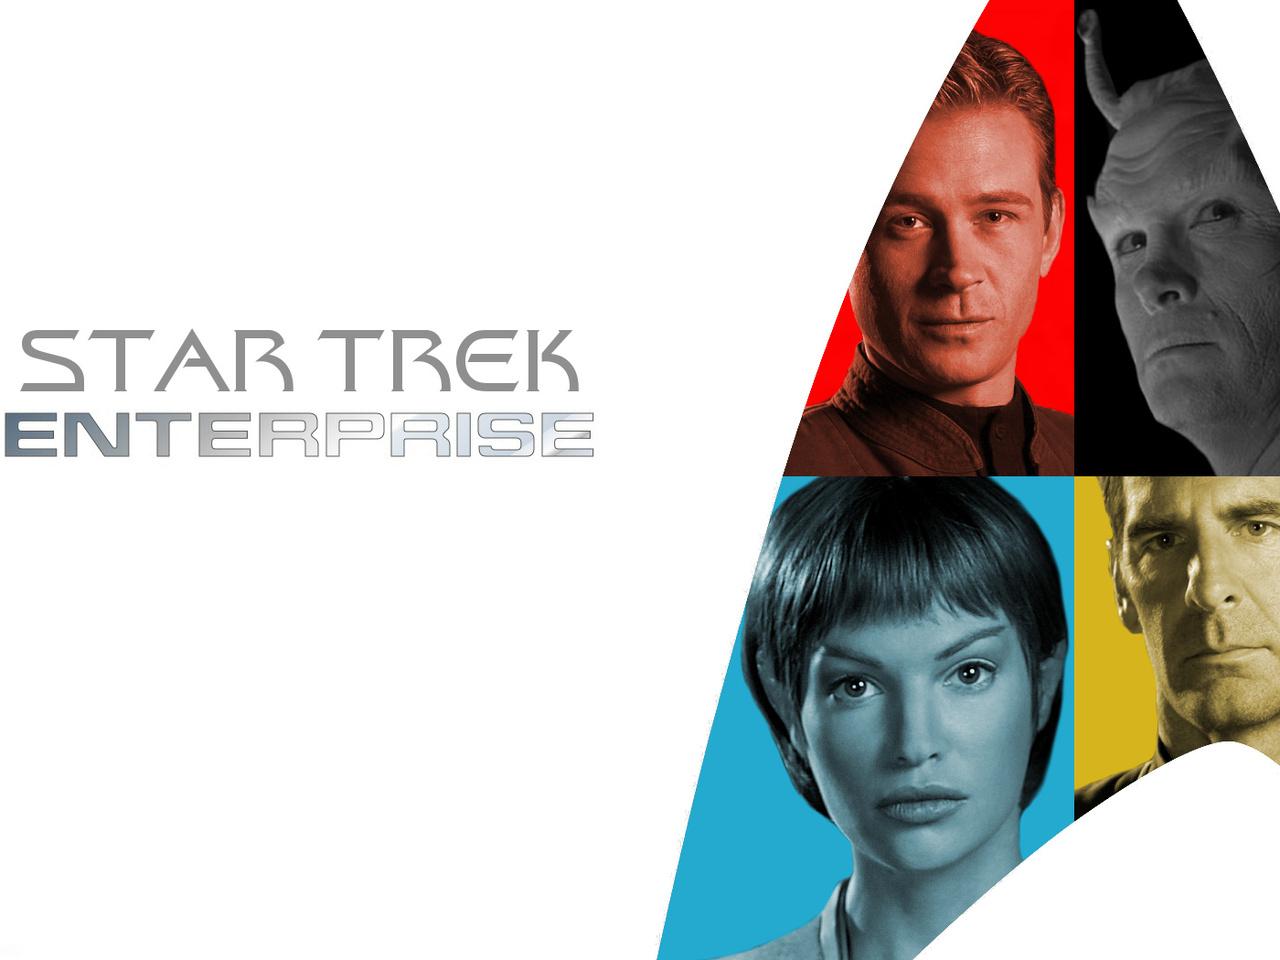 star trek, enterprise, звёздный путь, стар трек, энтерпрайз, тпол, арчер, трип, шран, star trek, enterprise, звёздный путь, стар трек, энтерпрайз, тпол, арчер, трип, киноактёры, кино